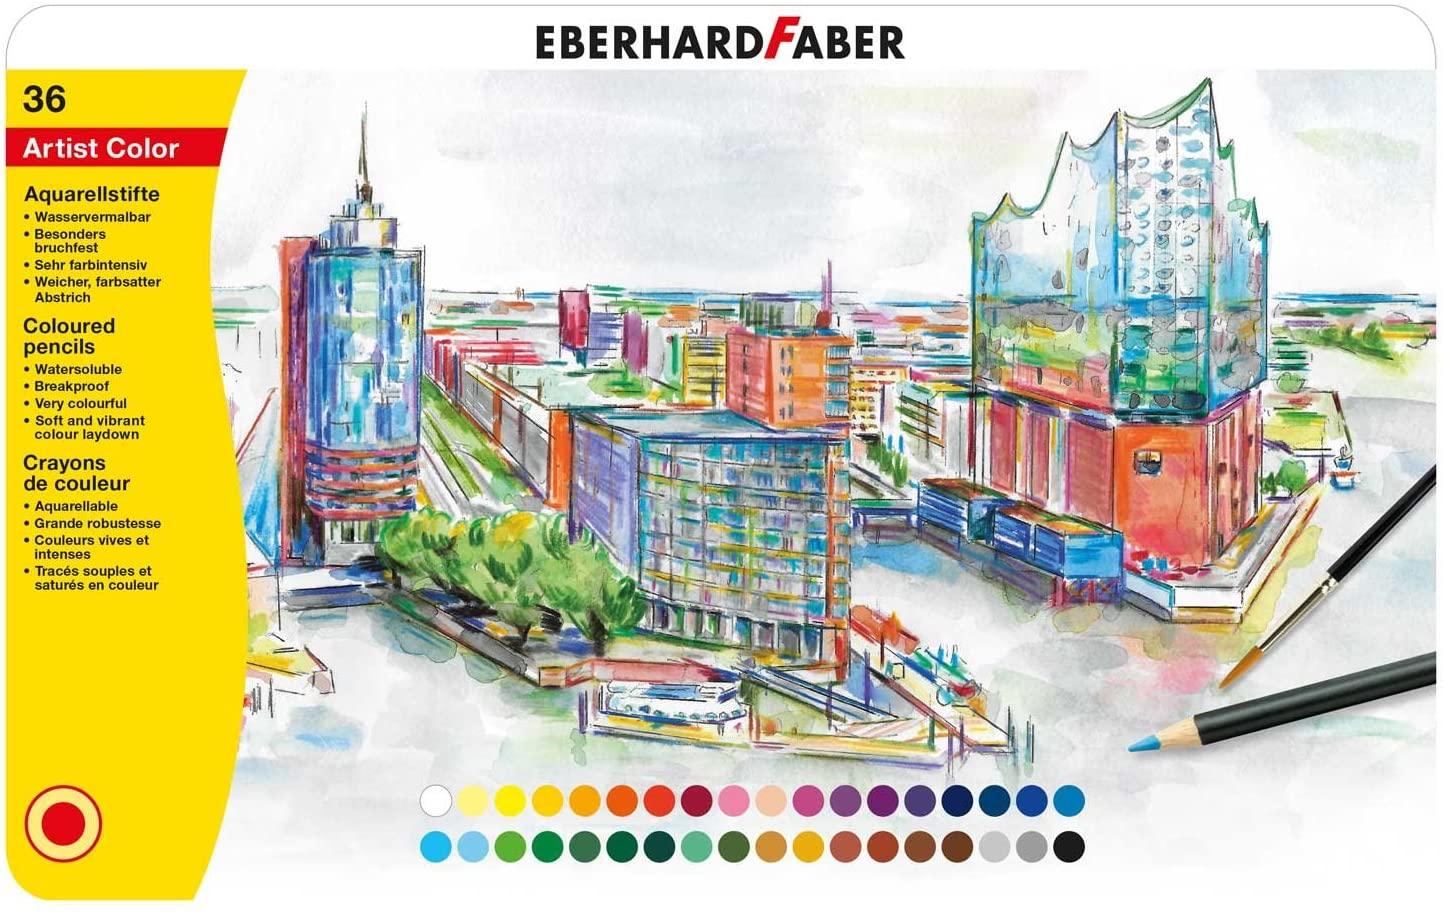 Eberhard Faber 516036 - Artist Color Aquarellfarbstifte in 36 Farben, runde Form, mit bruchsicherer